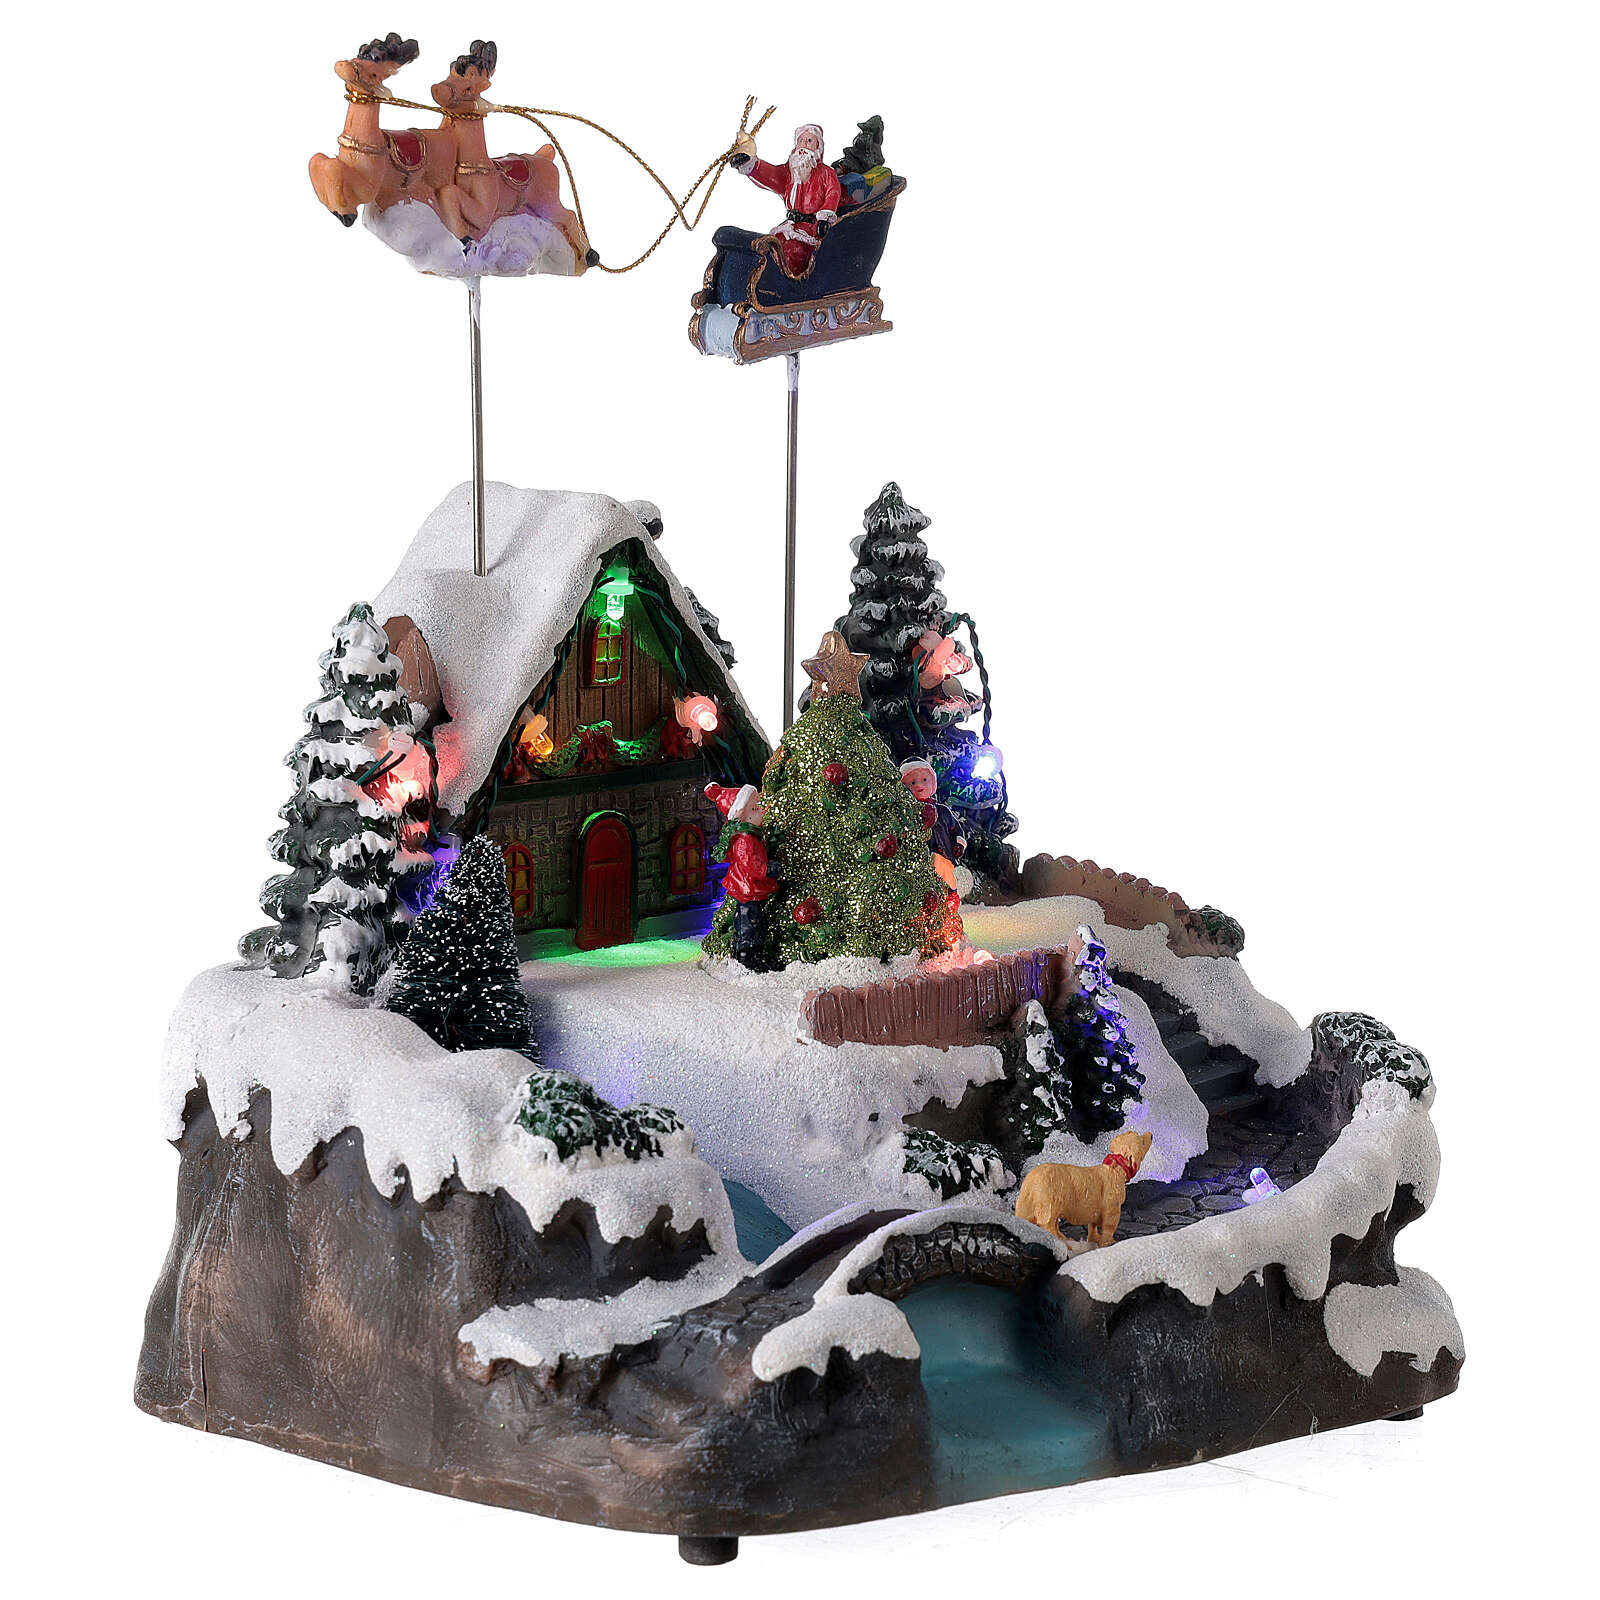 Santa Claus Christmas village lights music torrent 25x20x20 cm 3